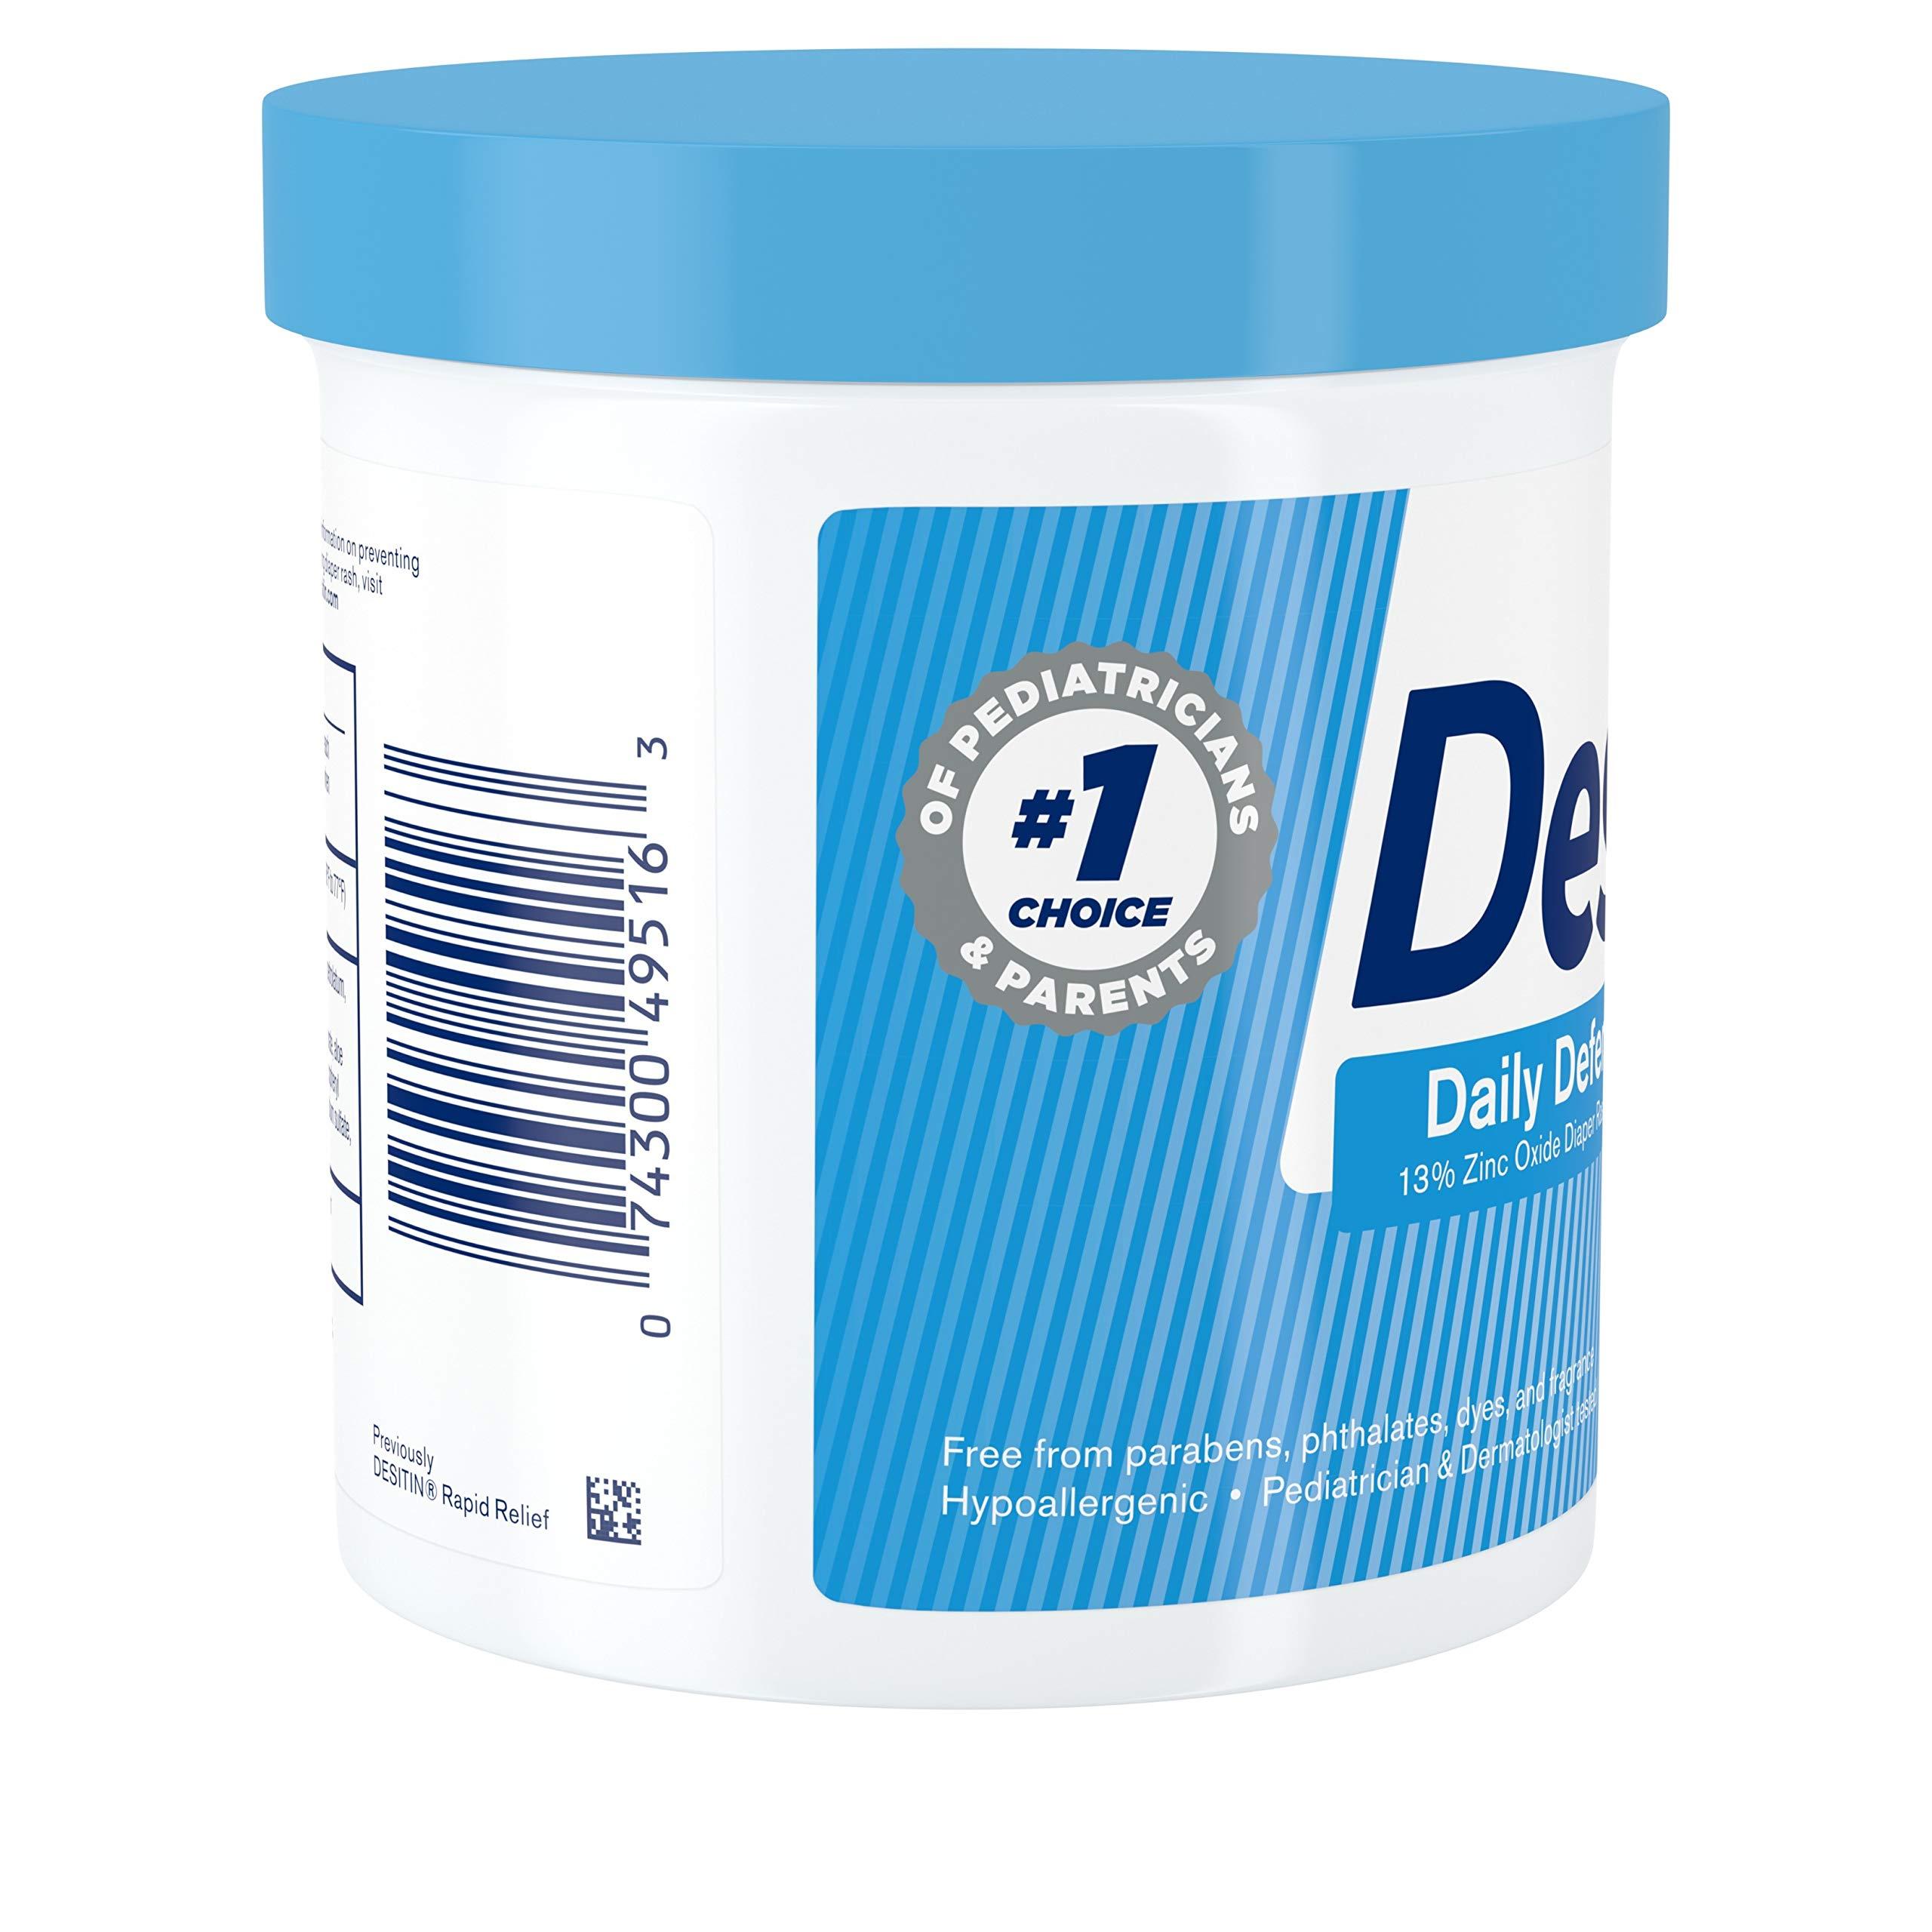 Desitin Daily Defense Baby Diaper Rash Cream with Zinc Oxide to Treat, Relieve & Prevent diaper rash, 16 oz by Desitin (Image #6)